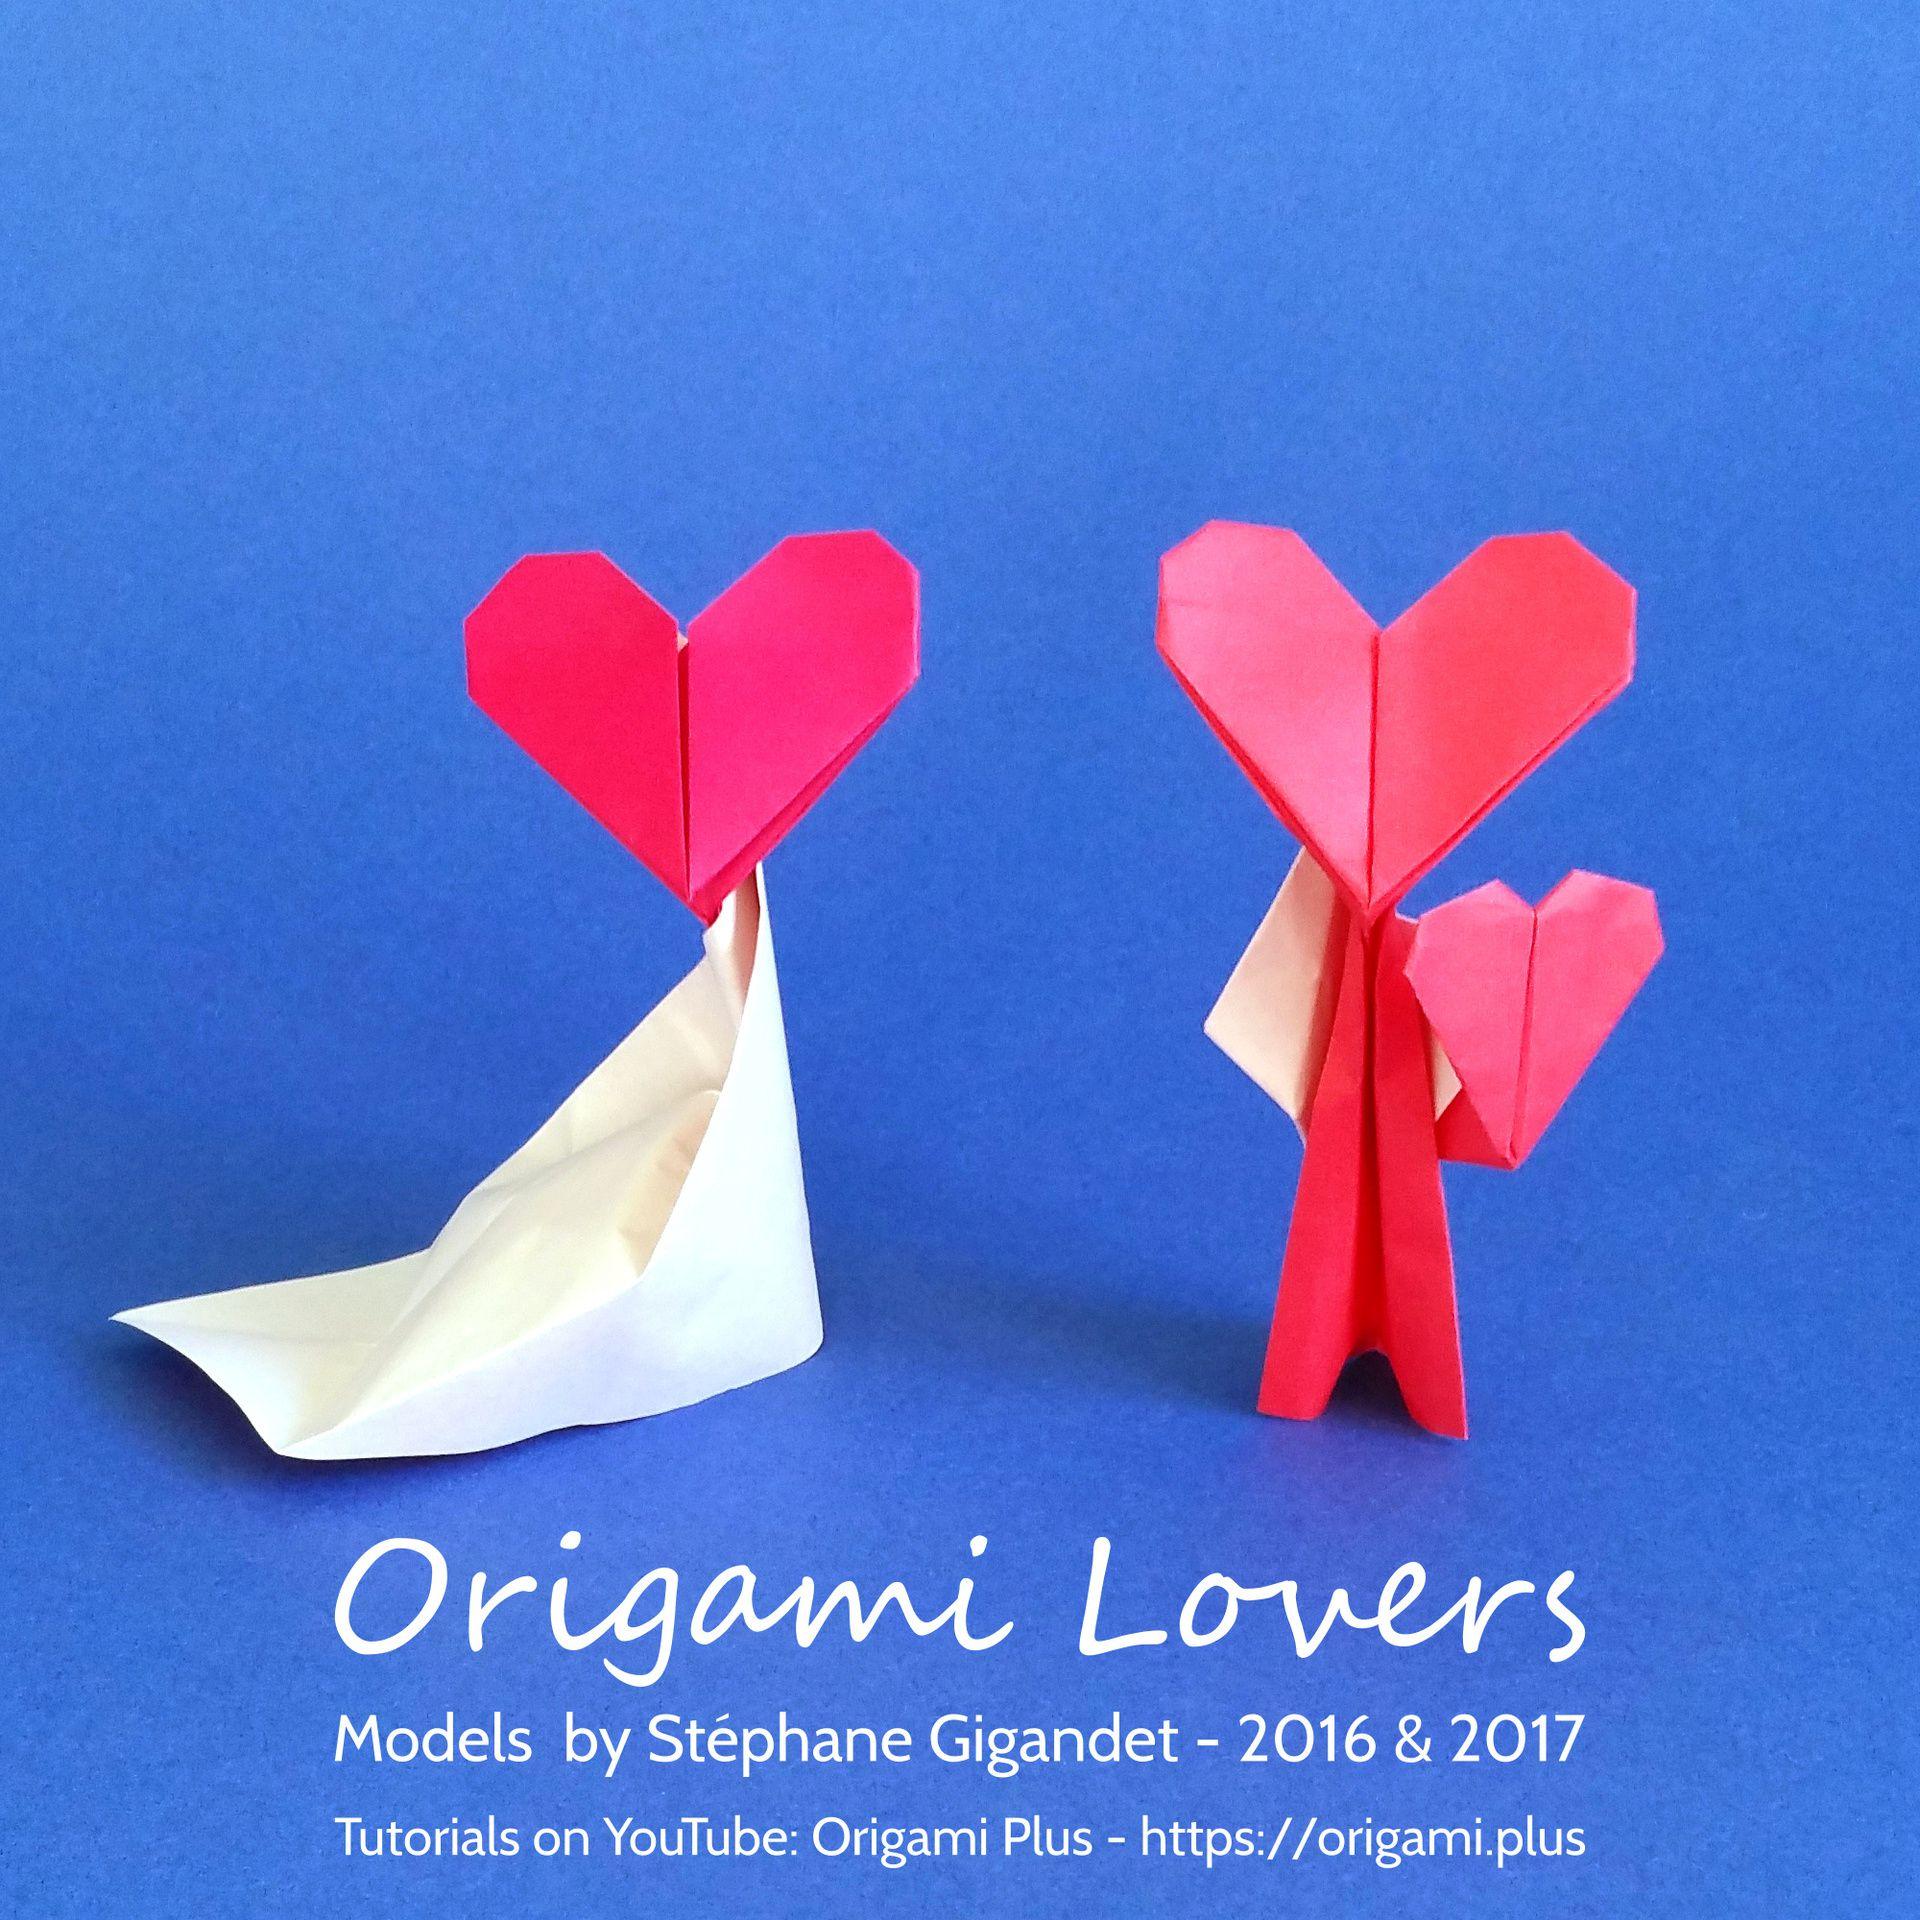 Origami love lady a couple of origami lovers jeuxipadfo Choice Image